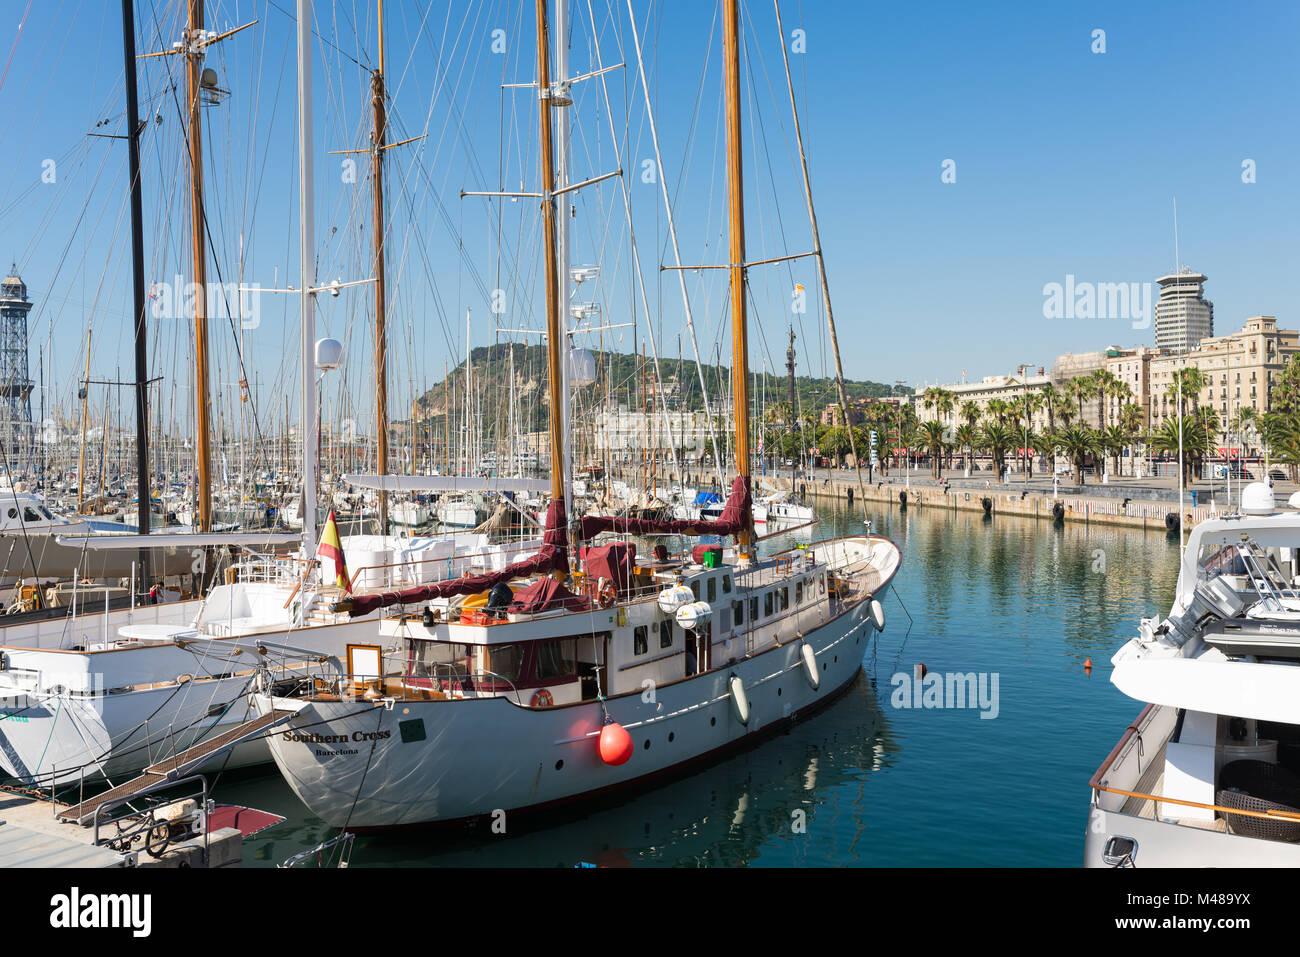 The marina Port Vell in the Barcelona district Ciutat Vella - Stock Image